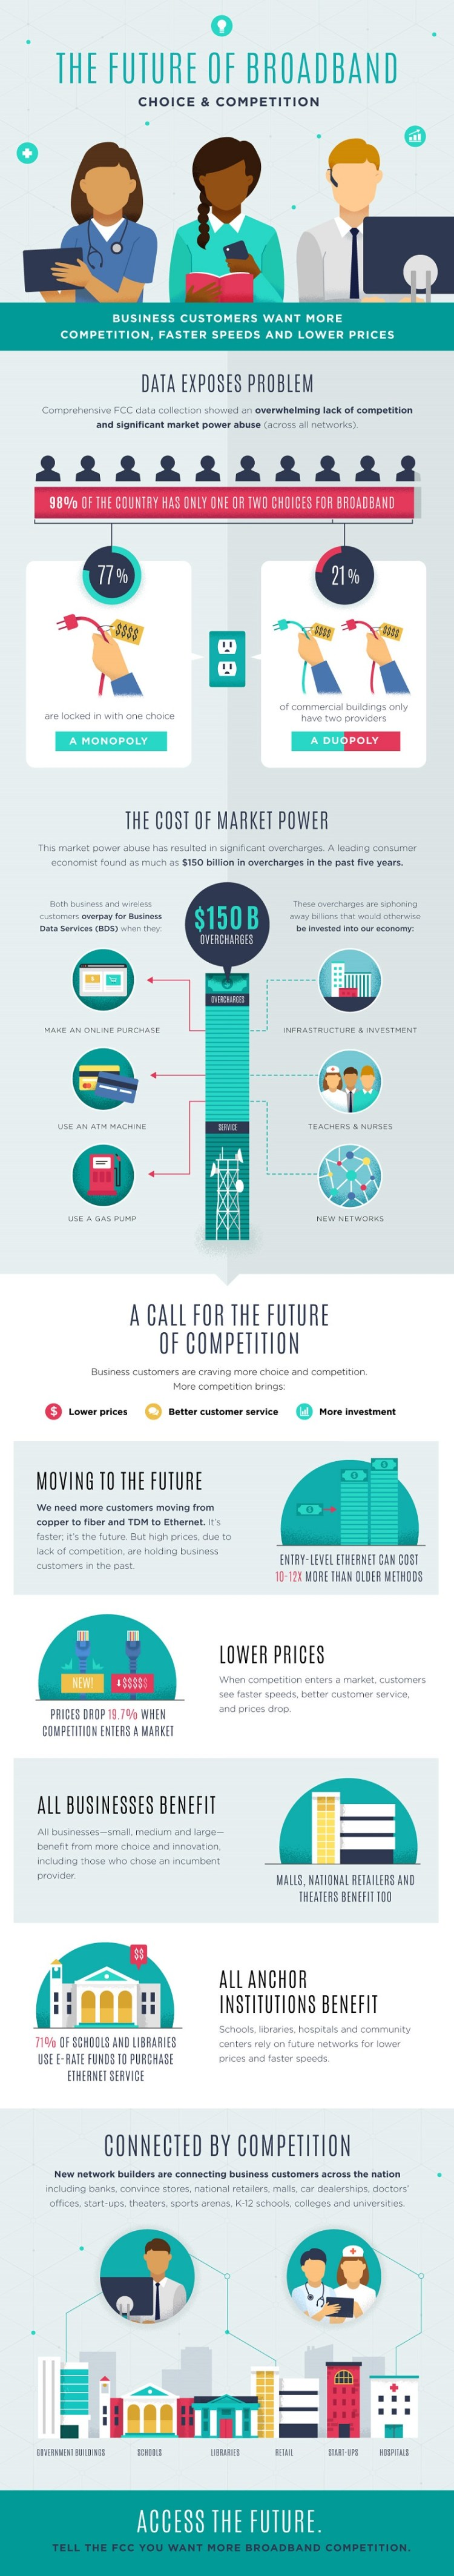 The Future of Broadband